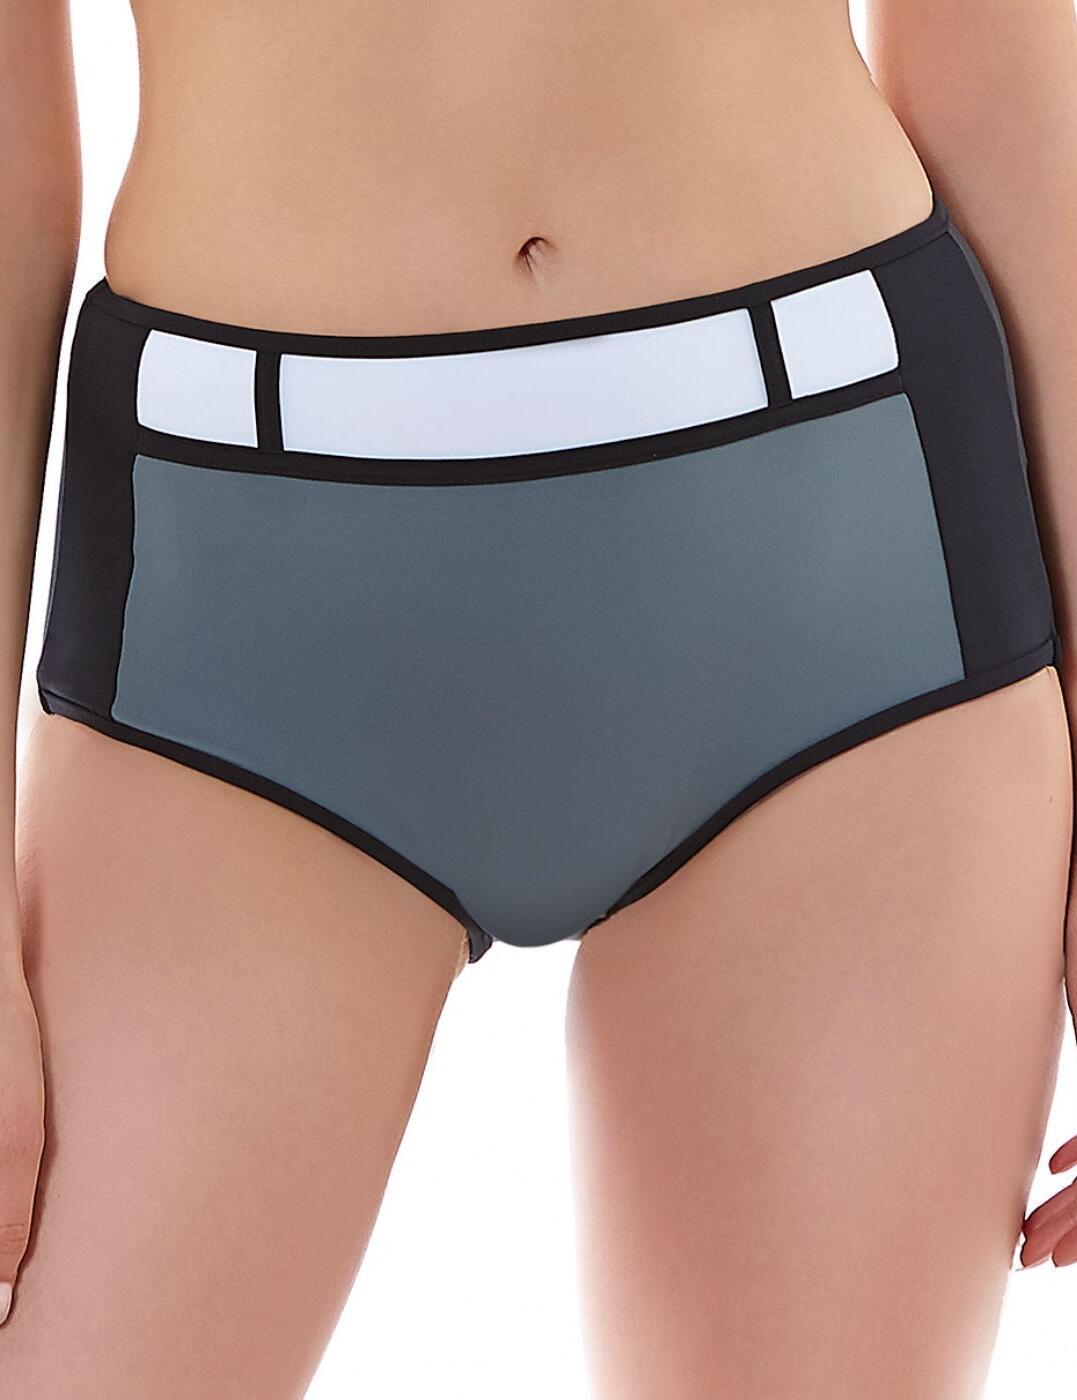 3967 Freya Bondi High Waisted Bikini Brief Black - 3967 Black